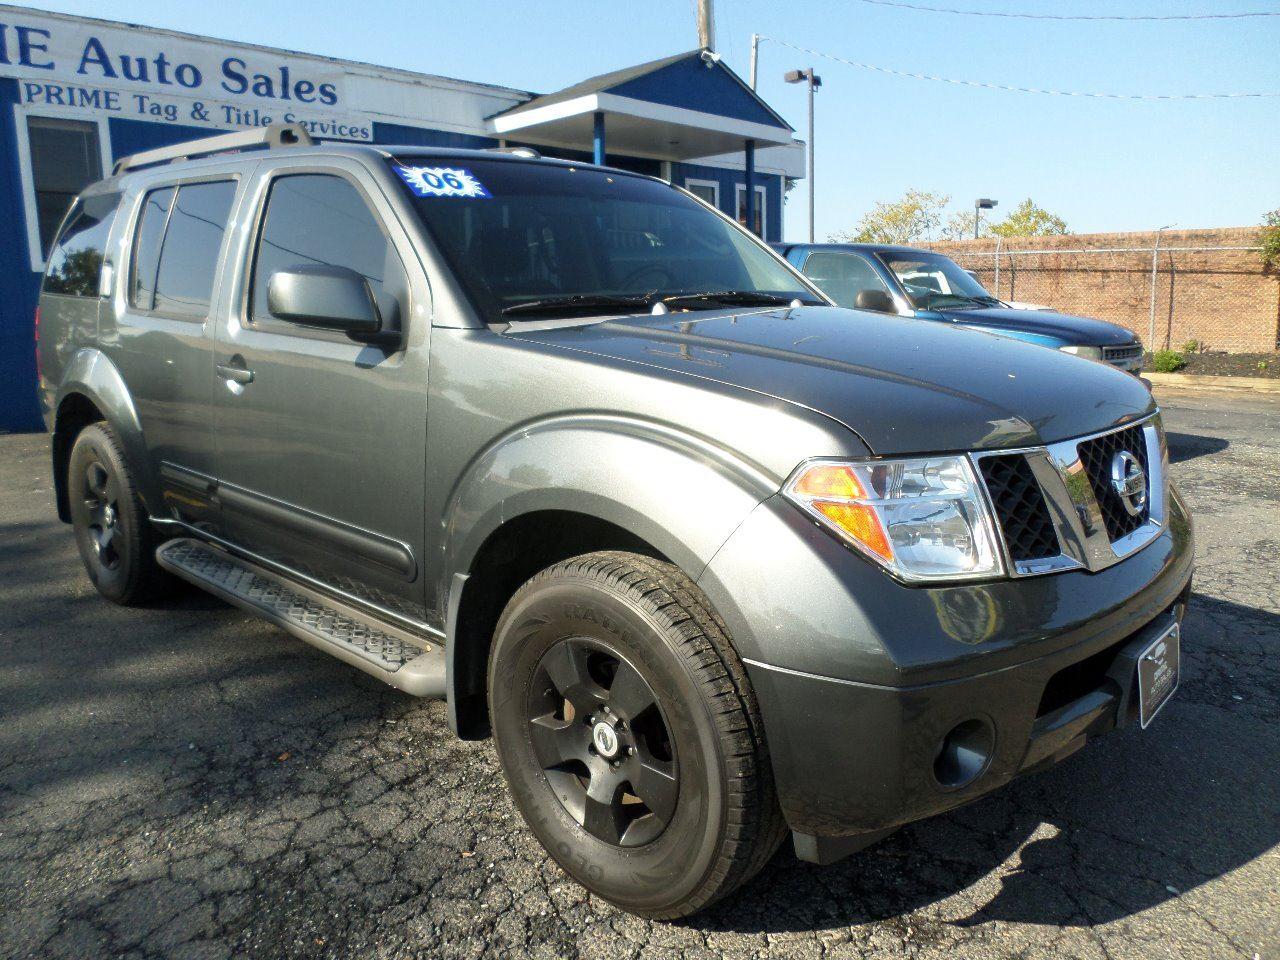 2006 Nissan Pathfinder SE In Baltimore MD - Prime Auto Sales